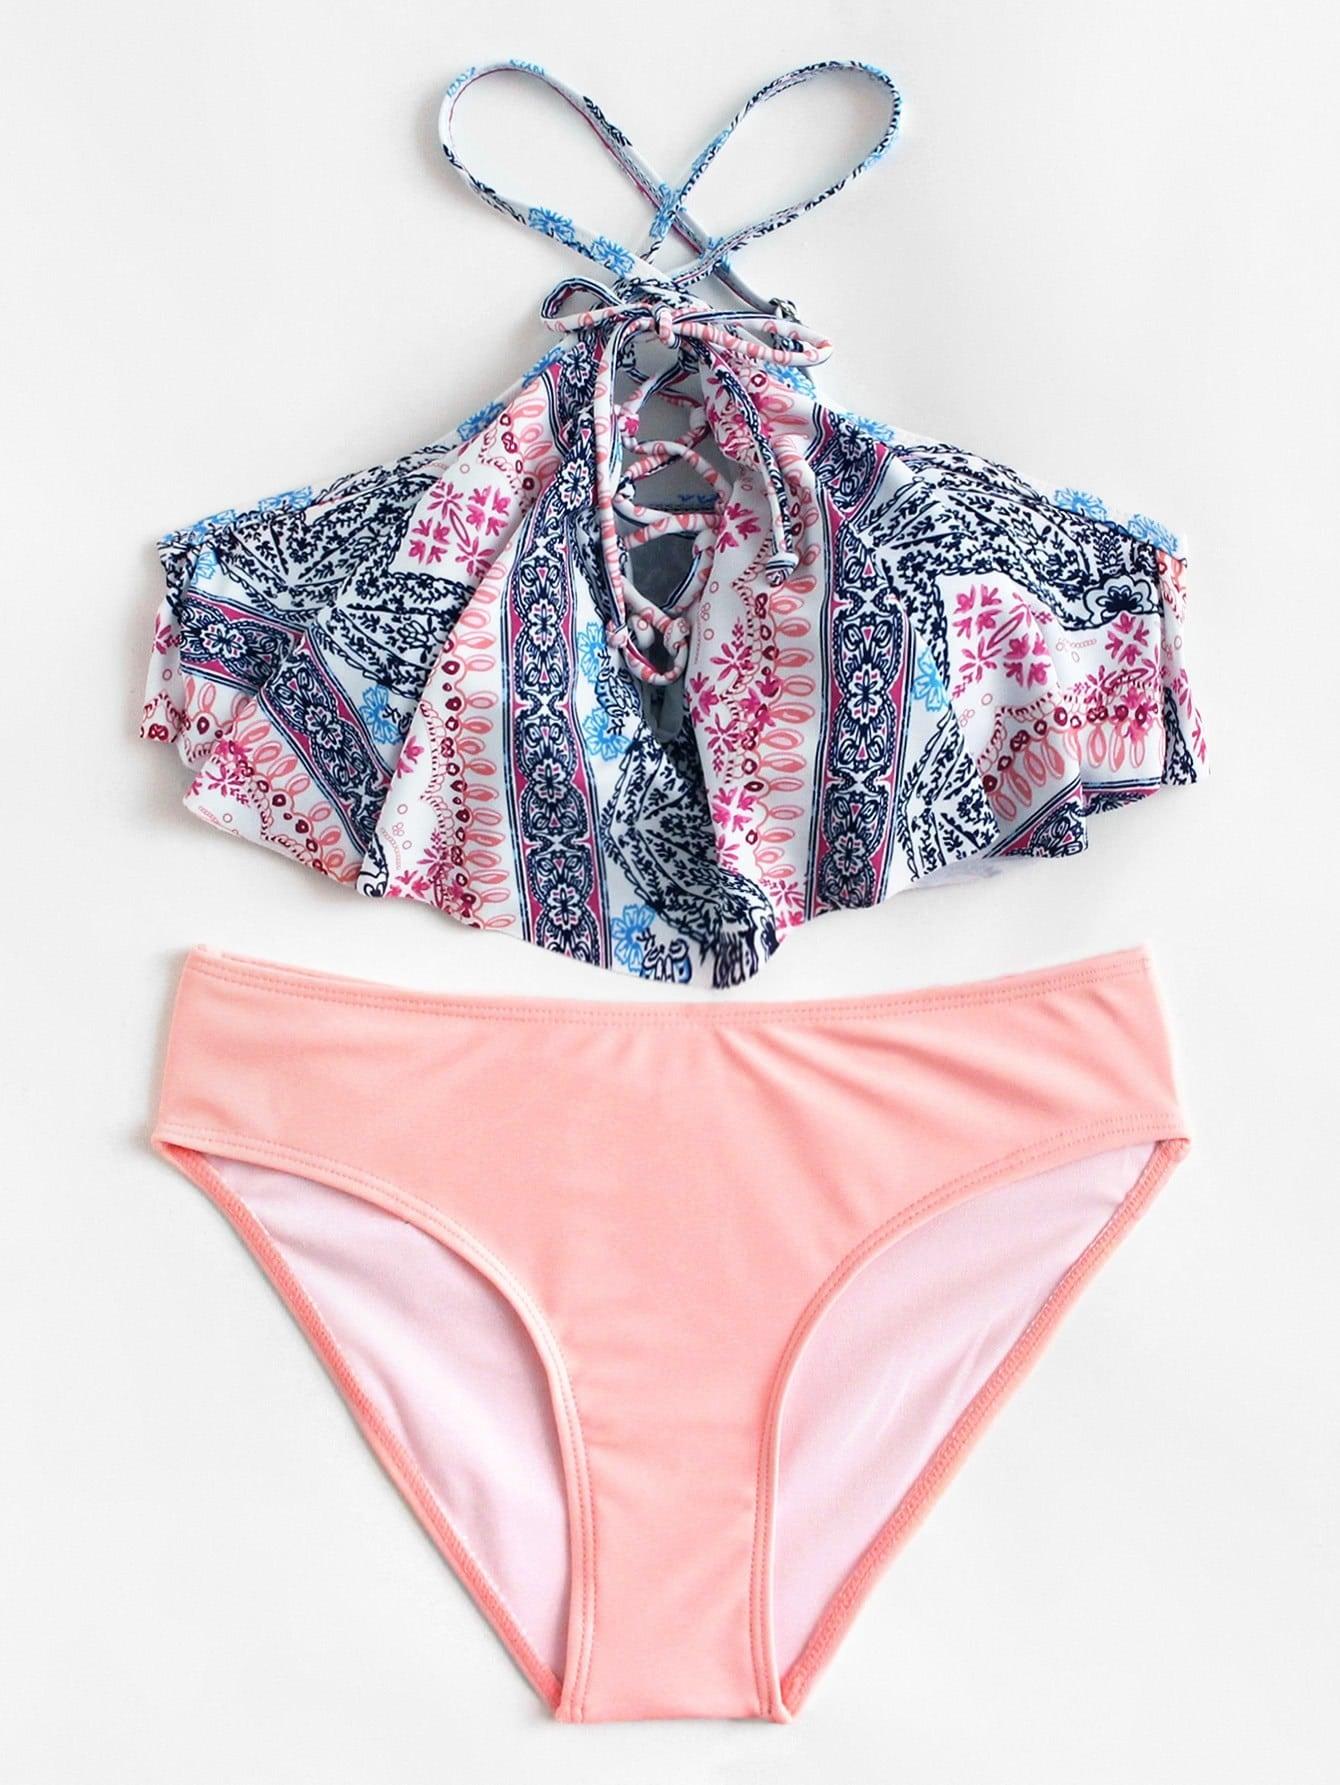 Фото Mixed Print Lace Up Bikini Set checker knot bikini set